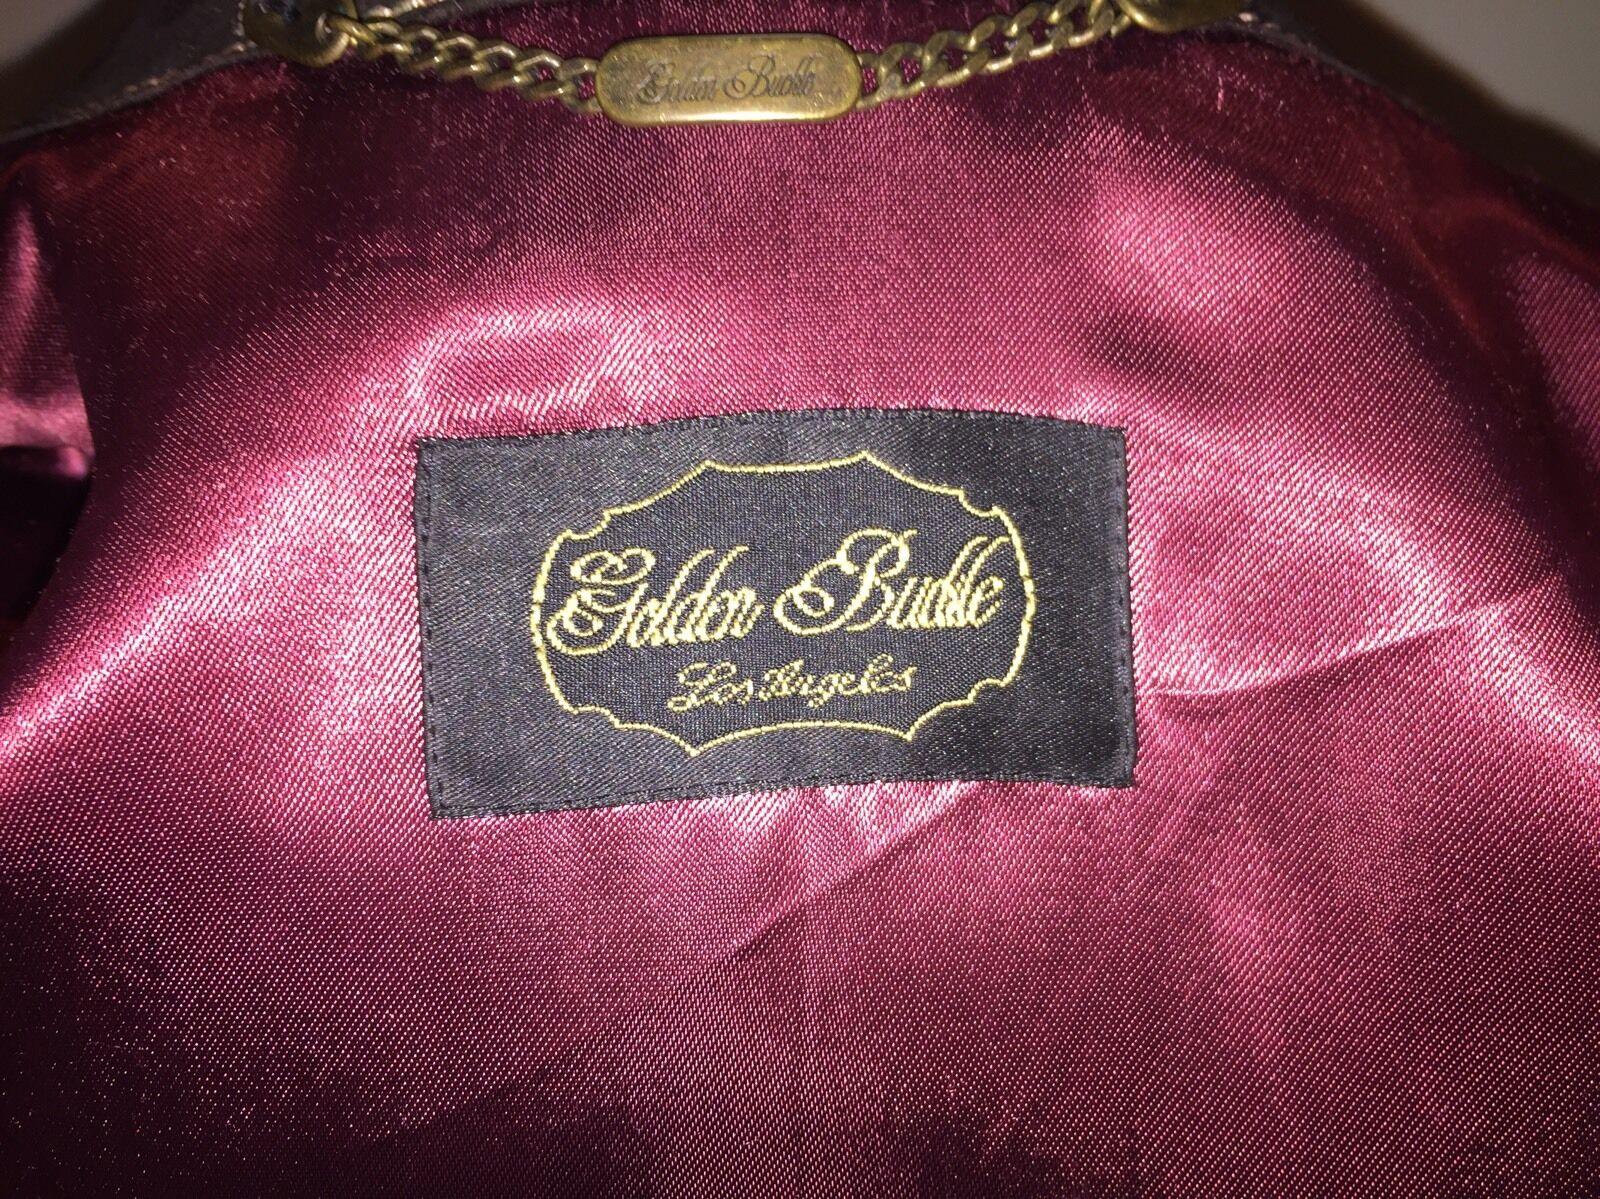 Reiterin edel Golden Budle Lederblazer Gr. 40 40 40 100% Leder Braun Damen Top Zustand c59a46